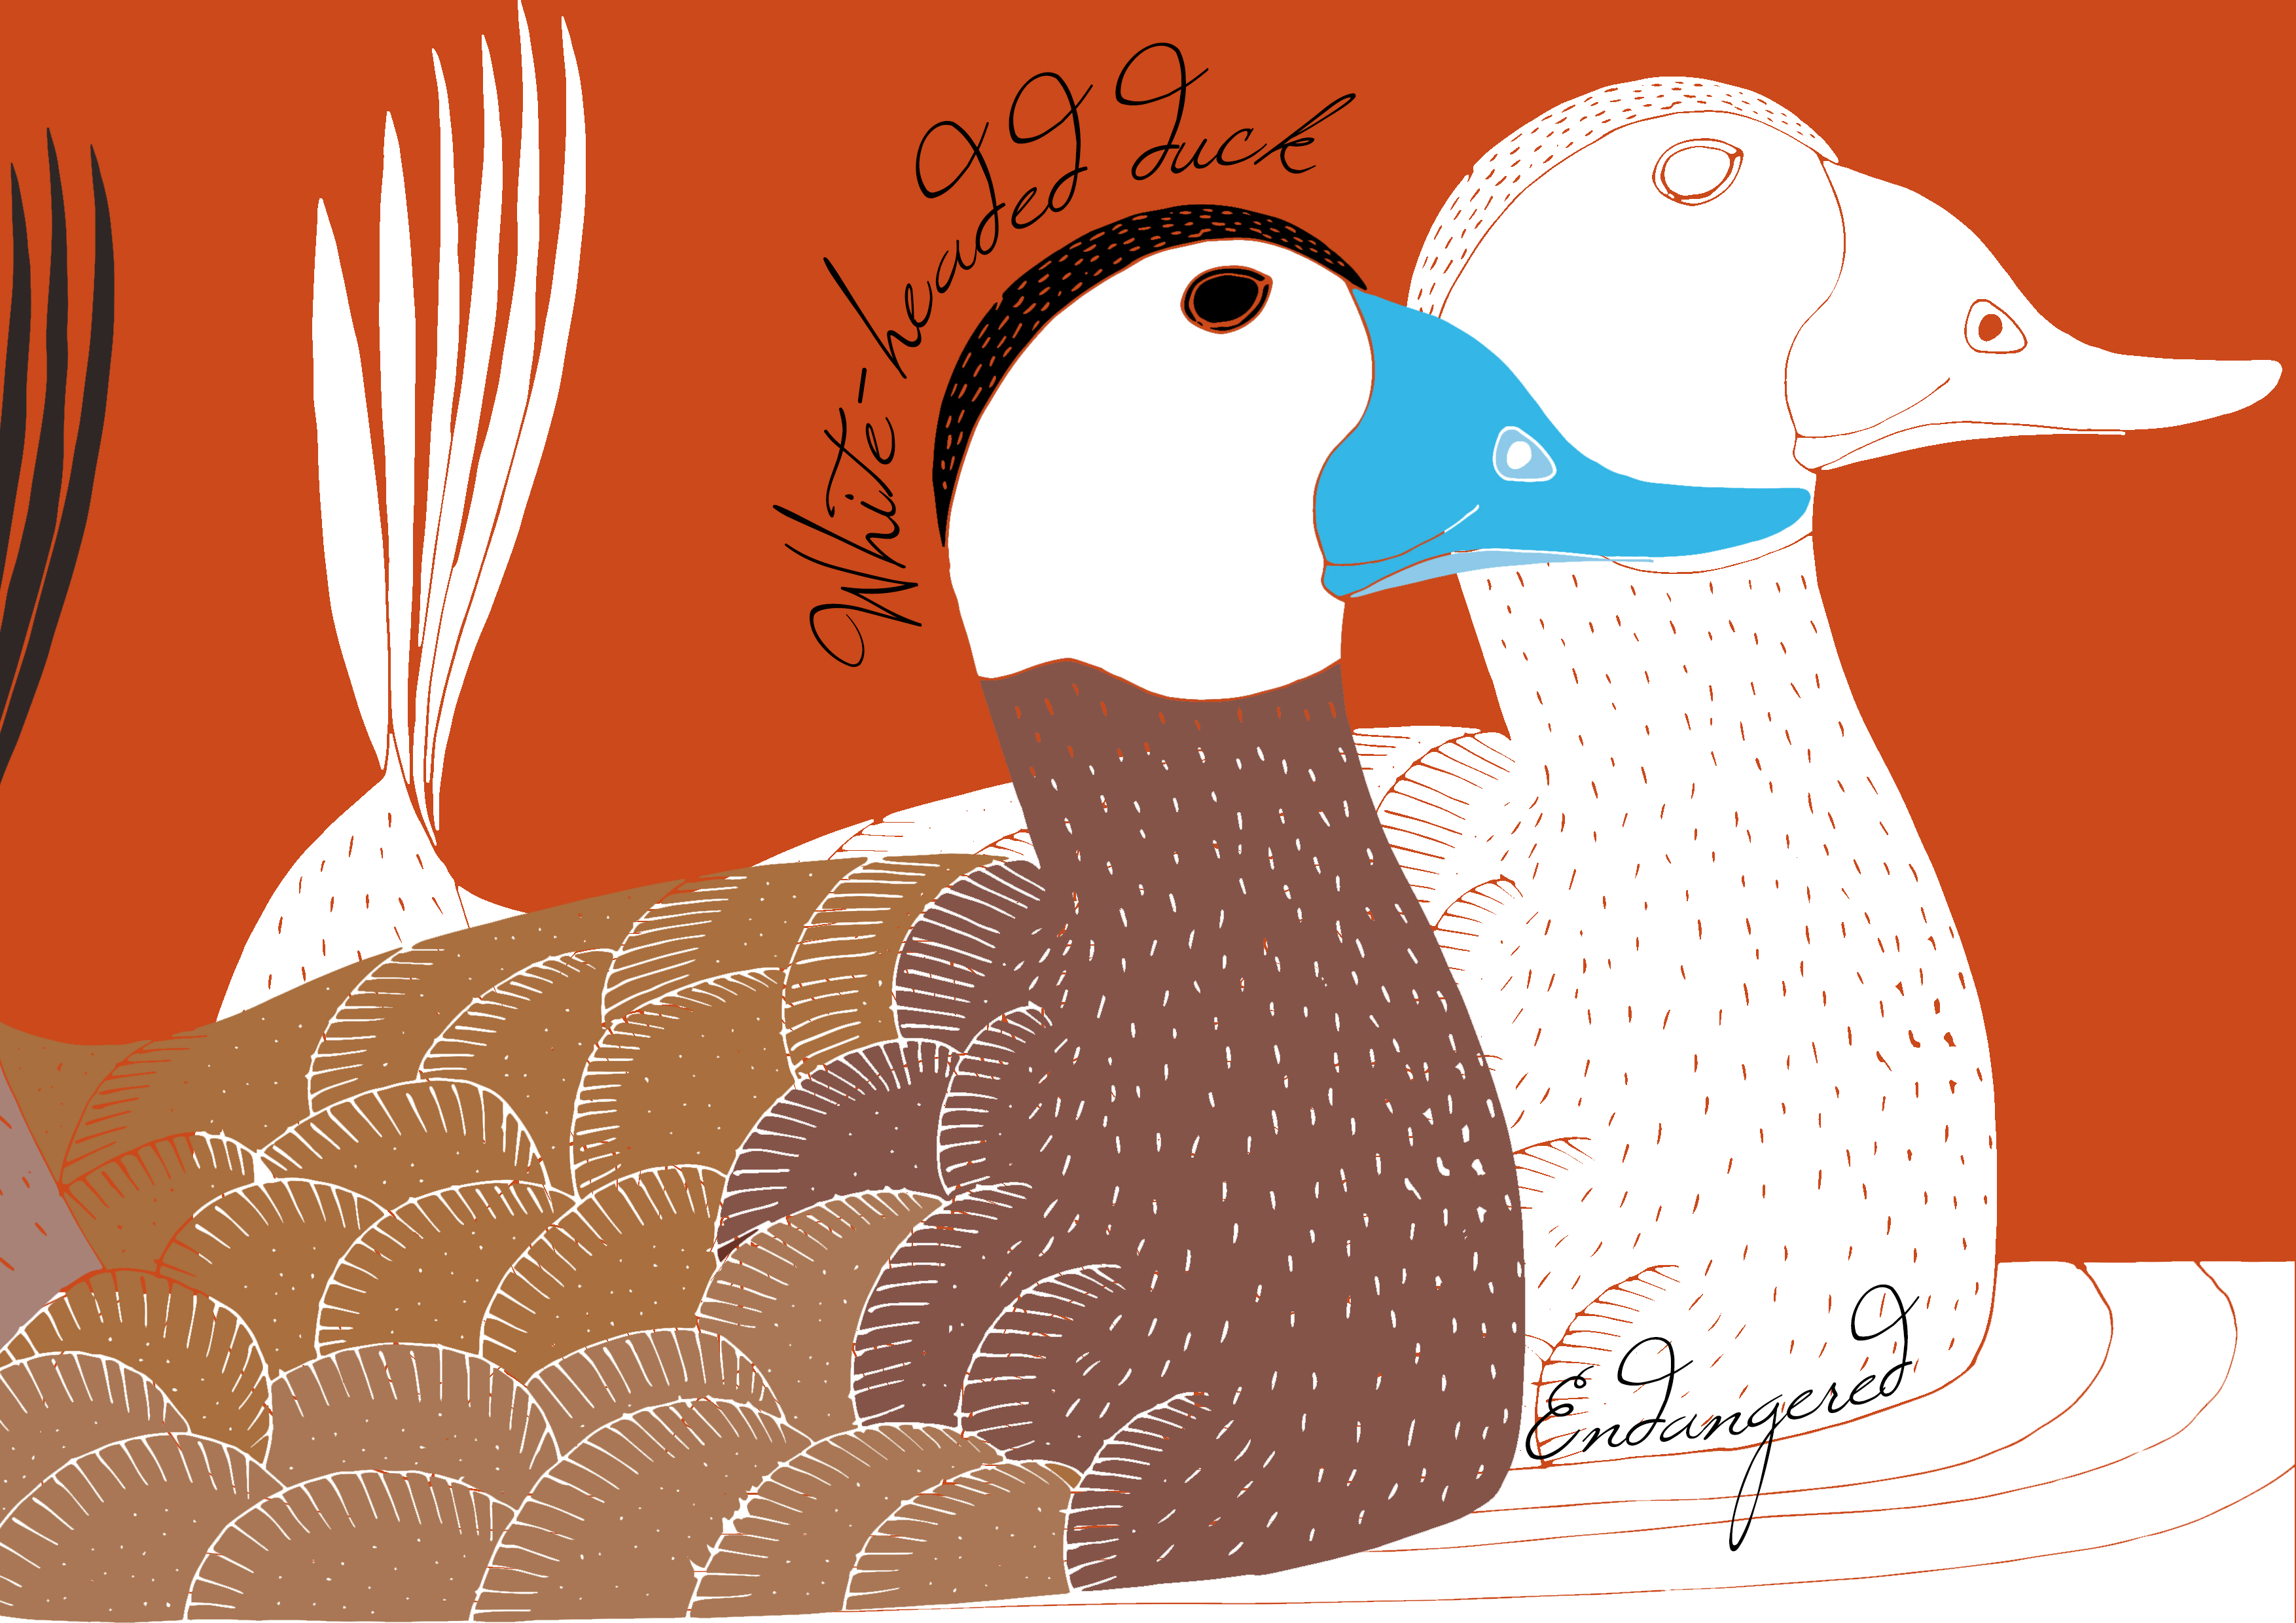 White_Headed_Duck_Forever Extinct_by Virginia Elena Patrone